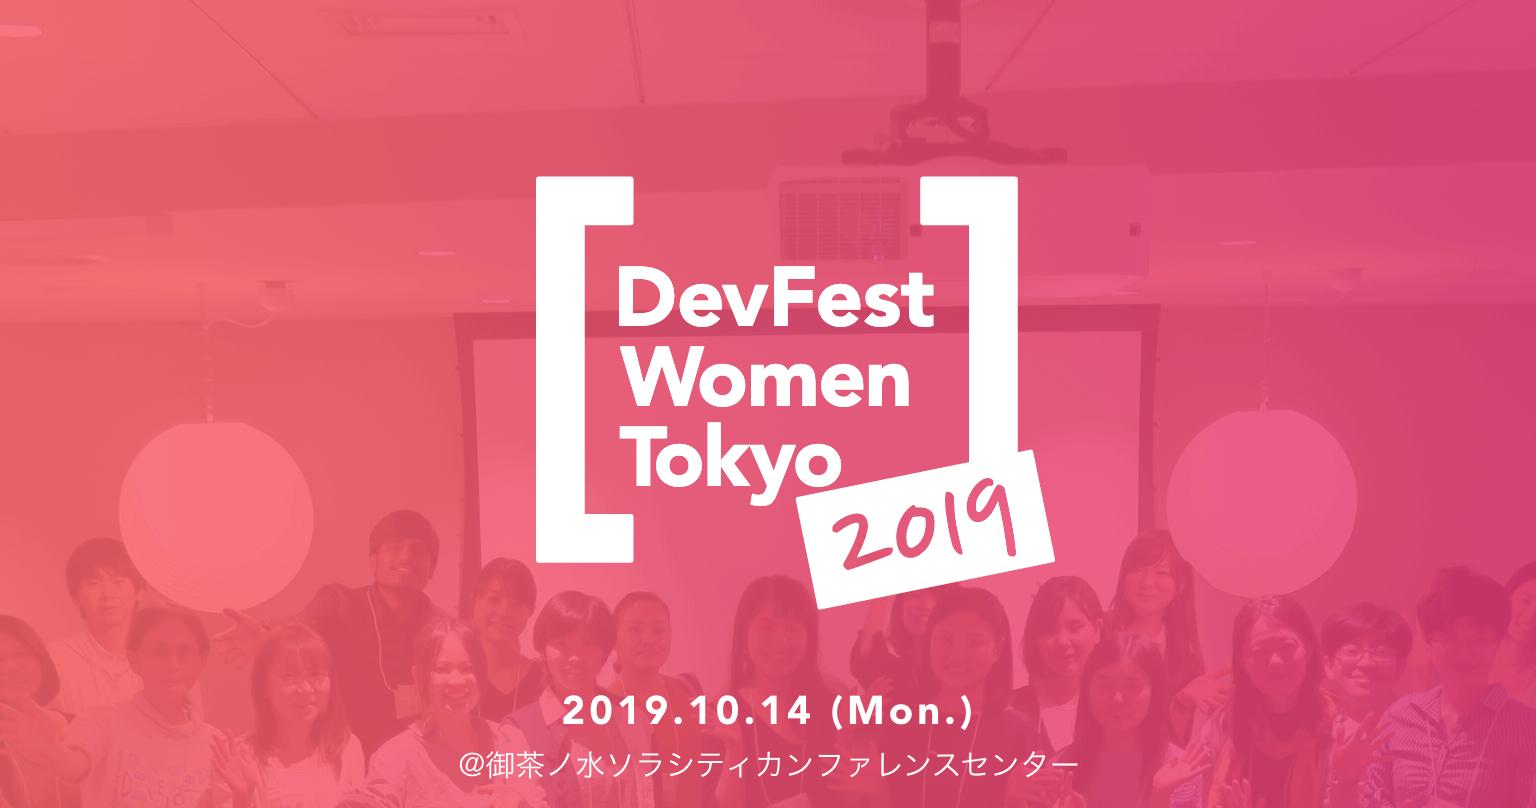 DevFest Women Tokyo 2019 に協賛